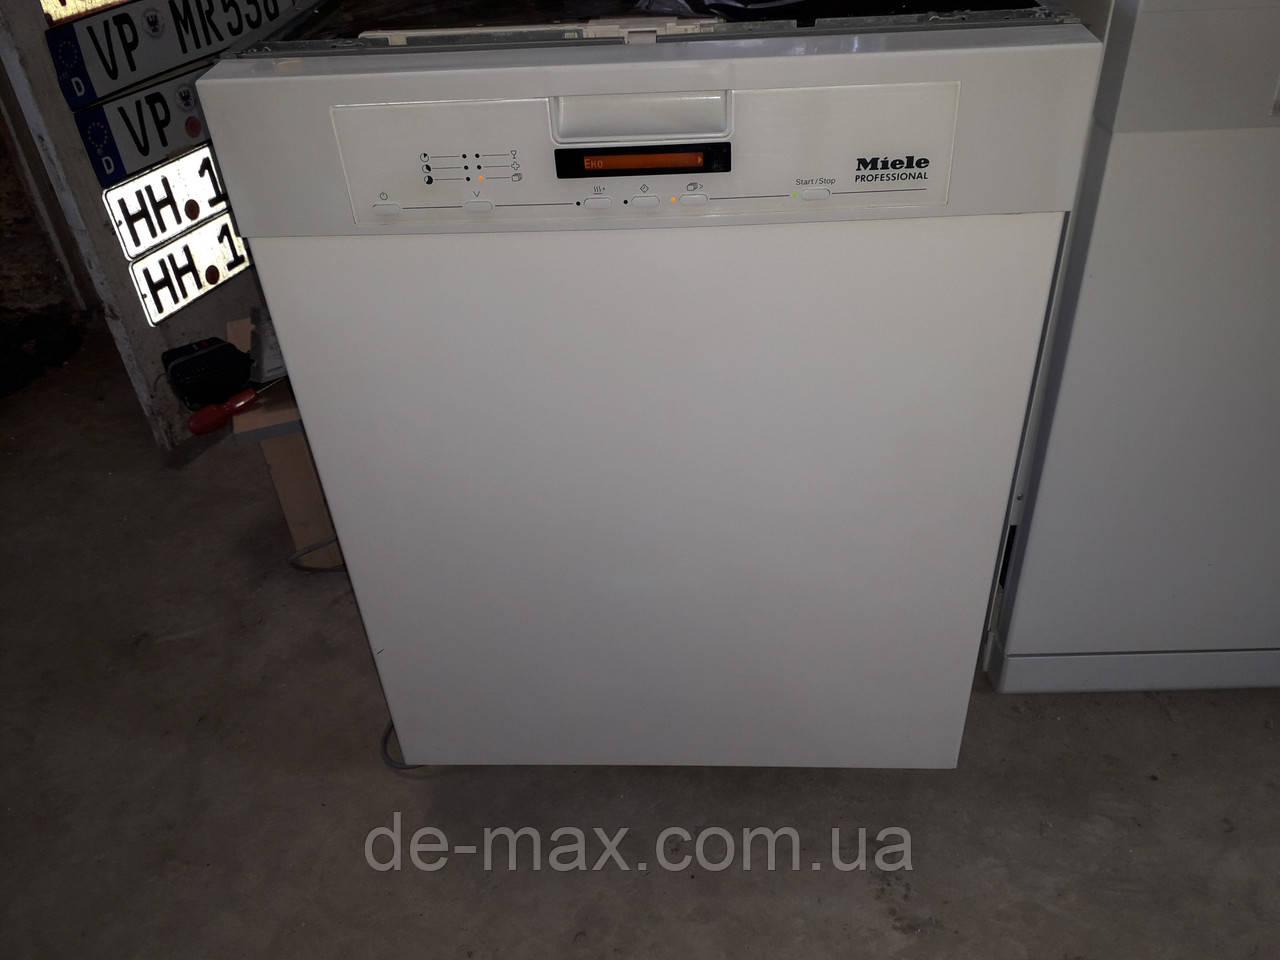 Посудомоечная машина Miele Professional PG8080U